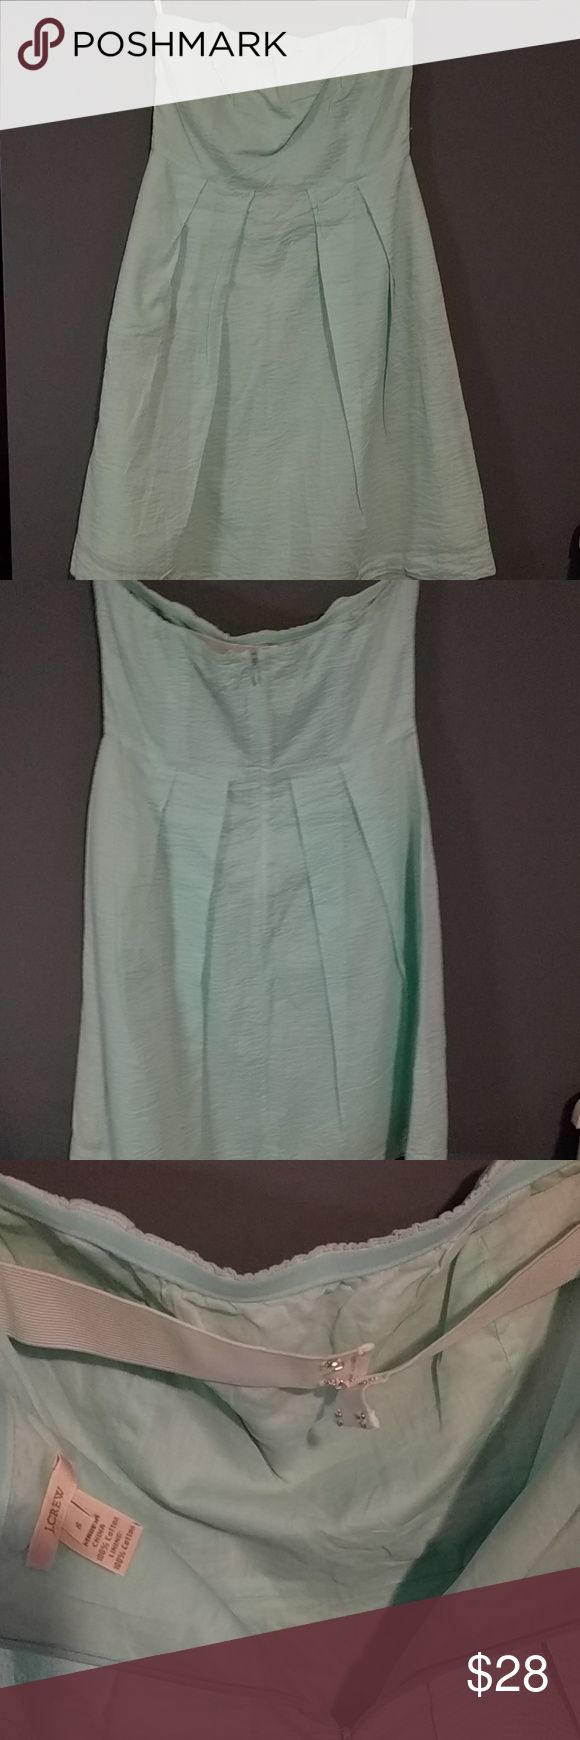 J.crew dress, NWOT Sea foam green j.crew dress, elastic enclosures for a snug fit Embossed dress J. Crew Dresses